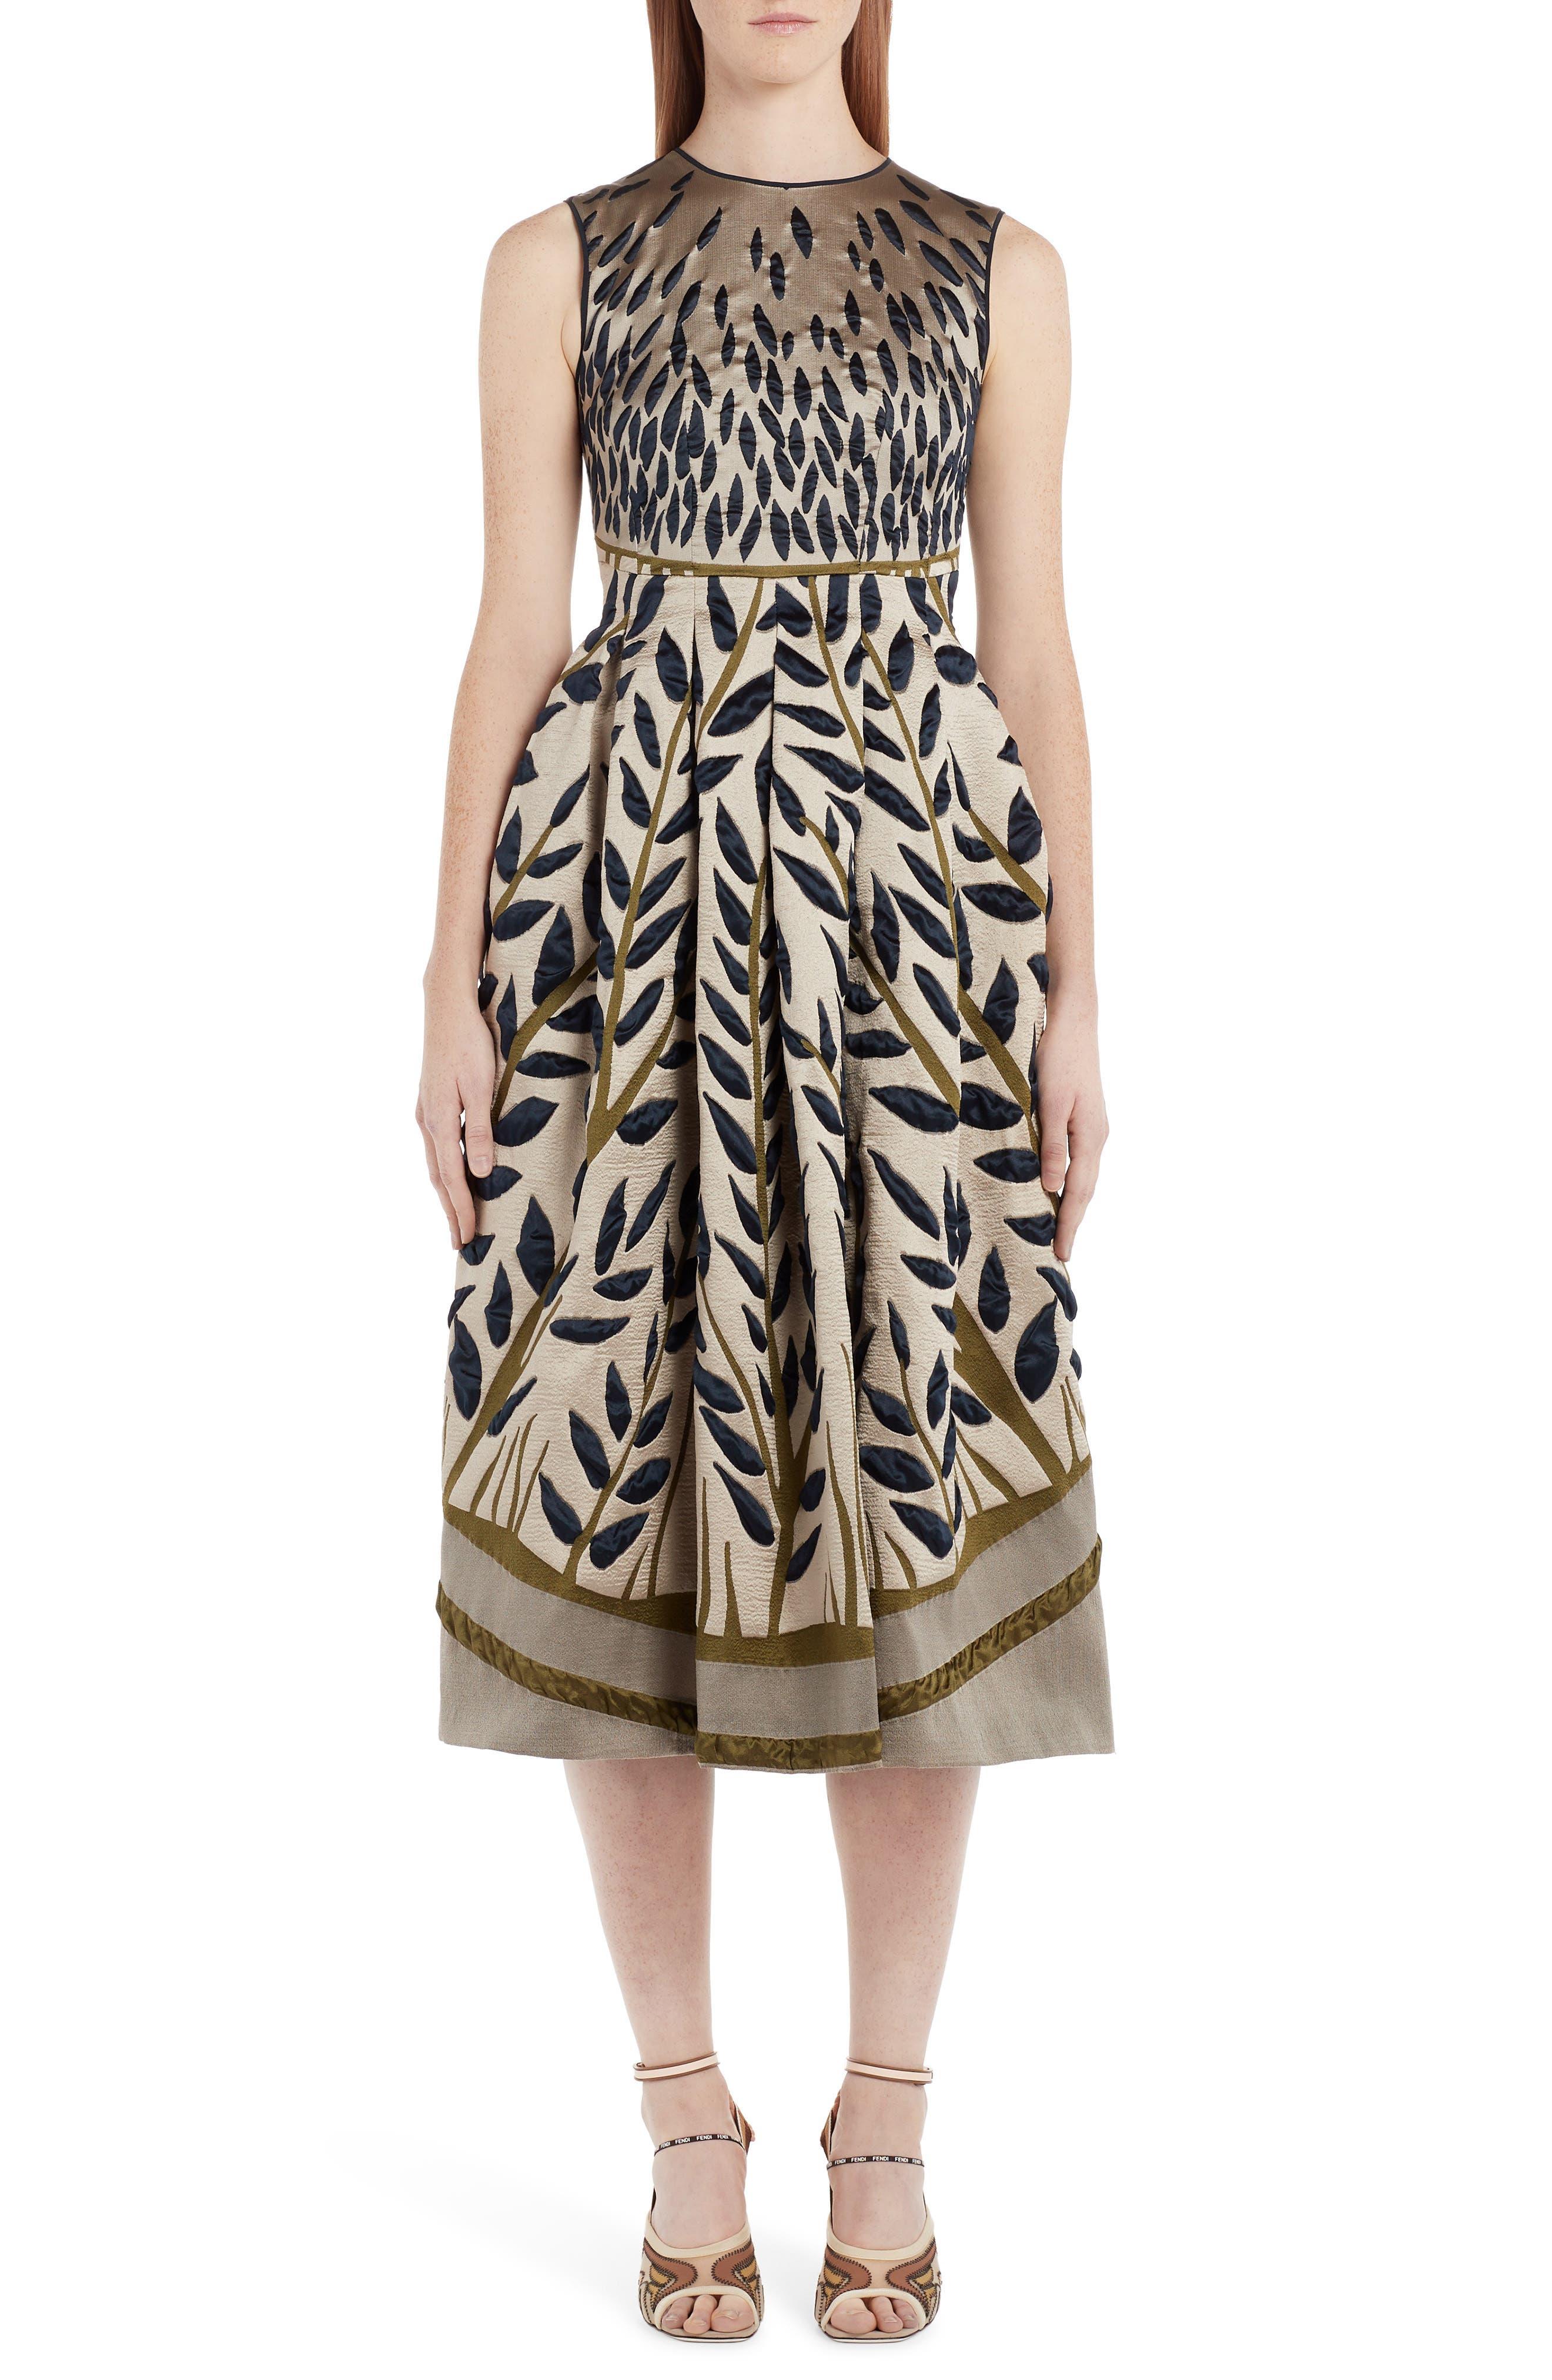 67408addac33 Women s Fendi Designer Dresses